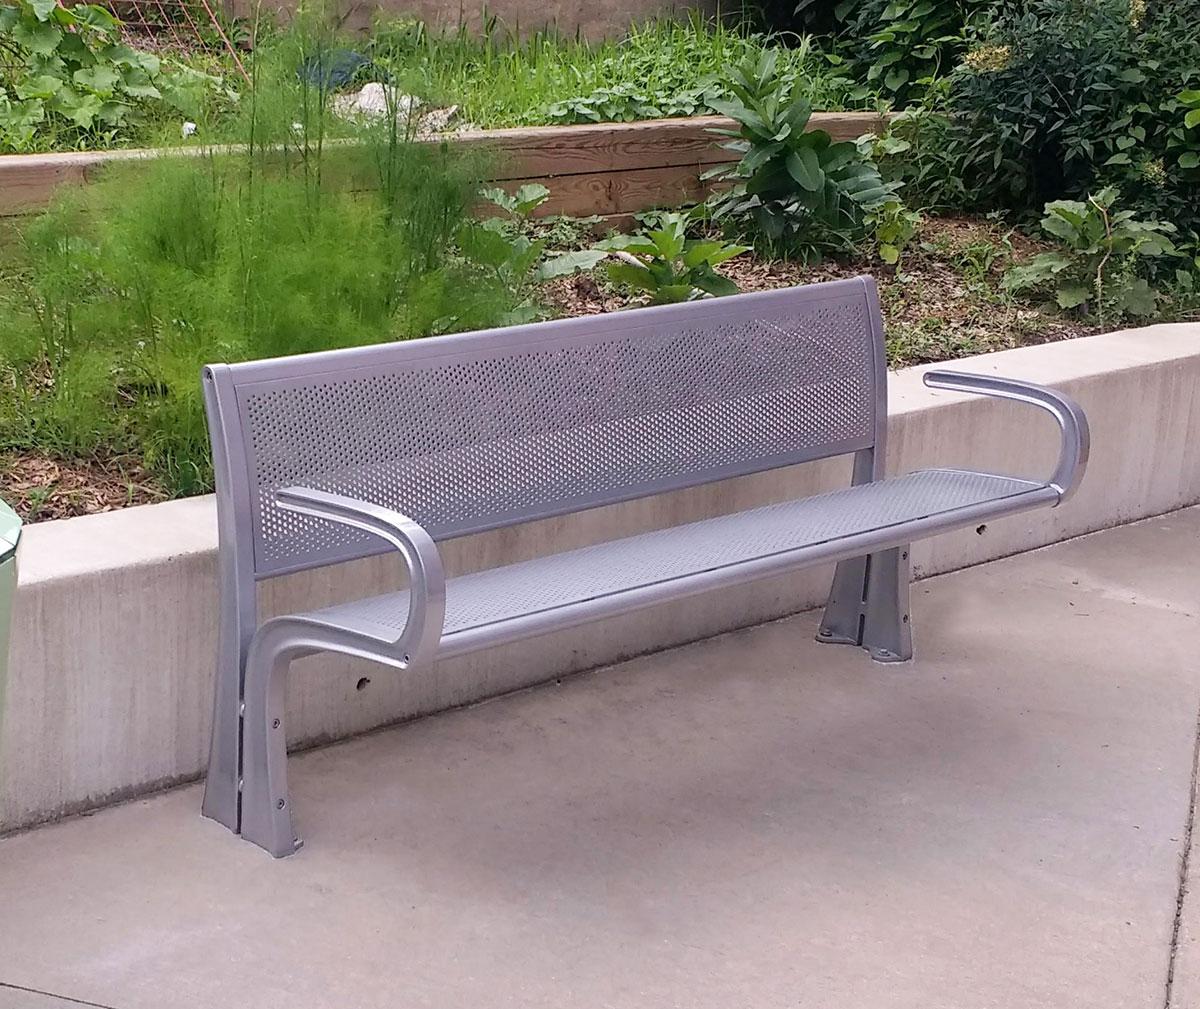 park bench - metal